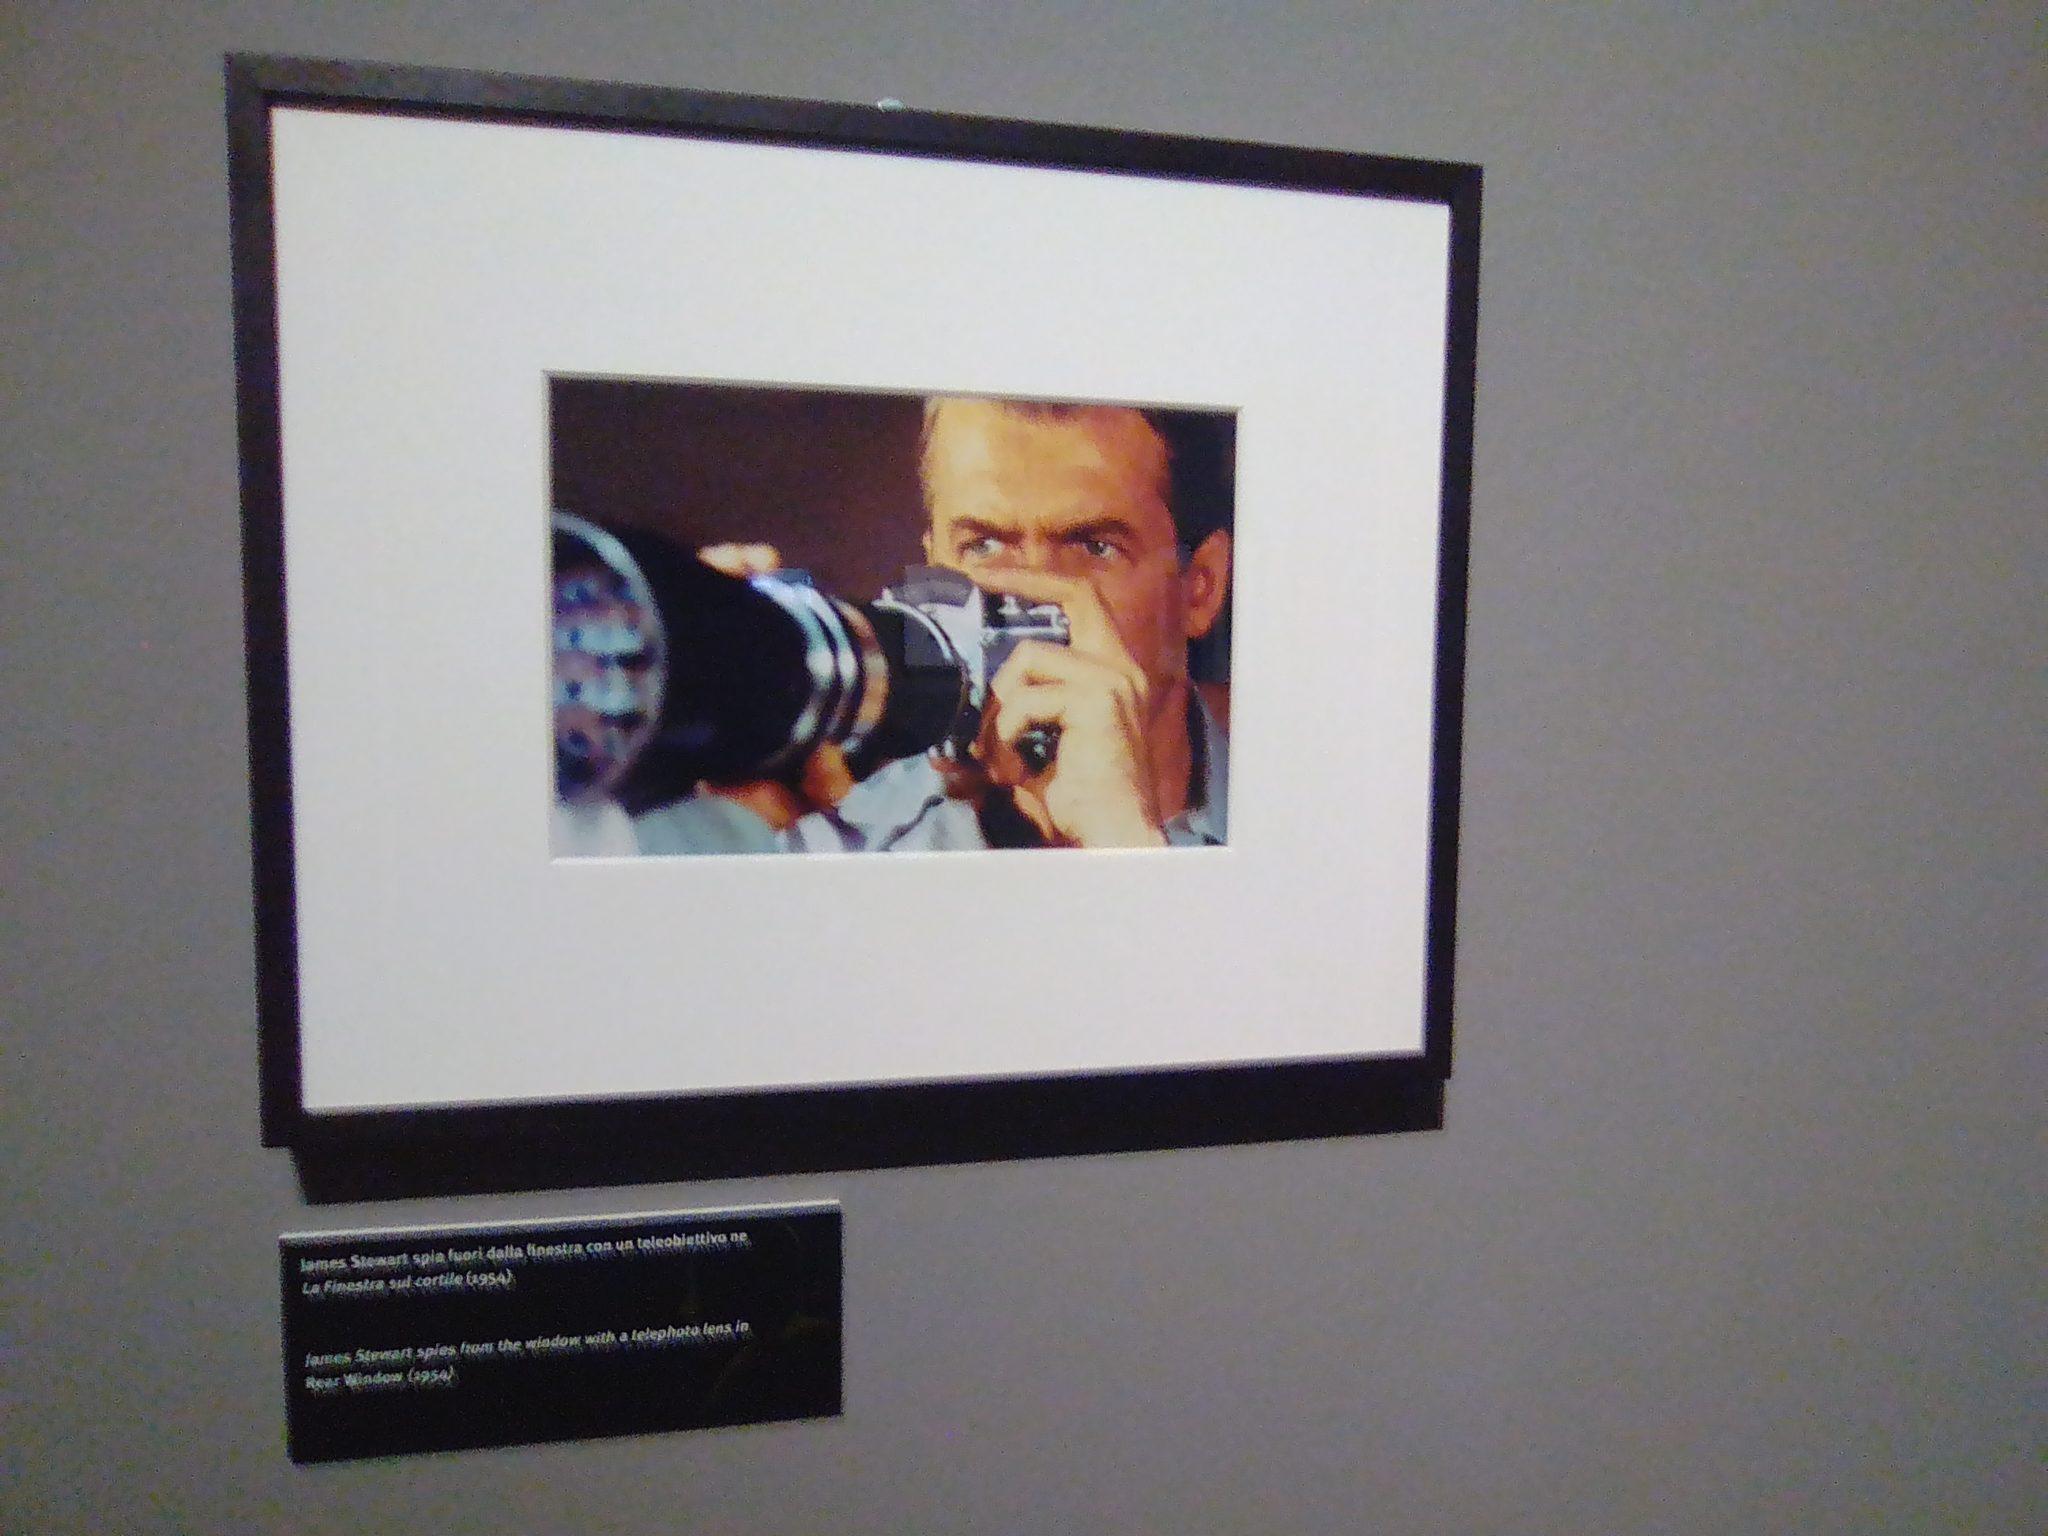 A Genova, una mostra fotografica ricorda Alfred Hitchcok